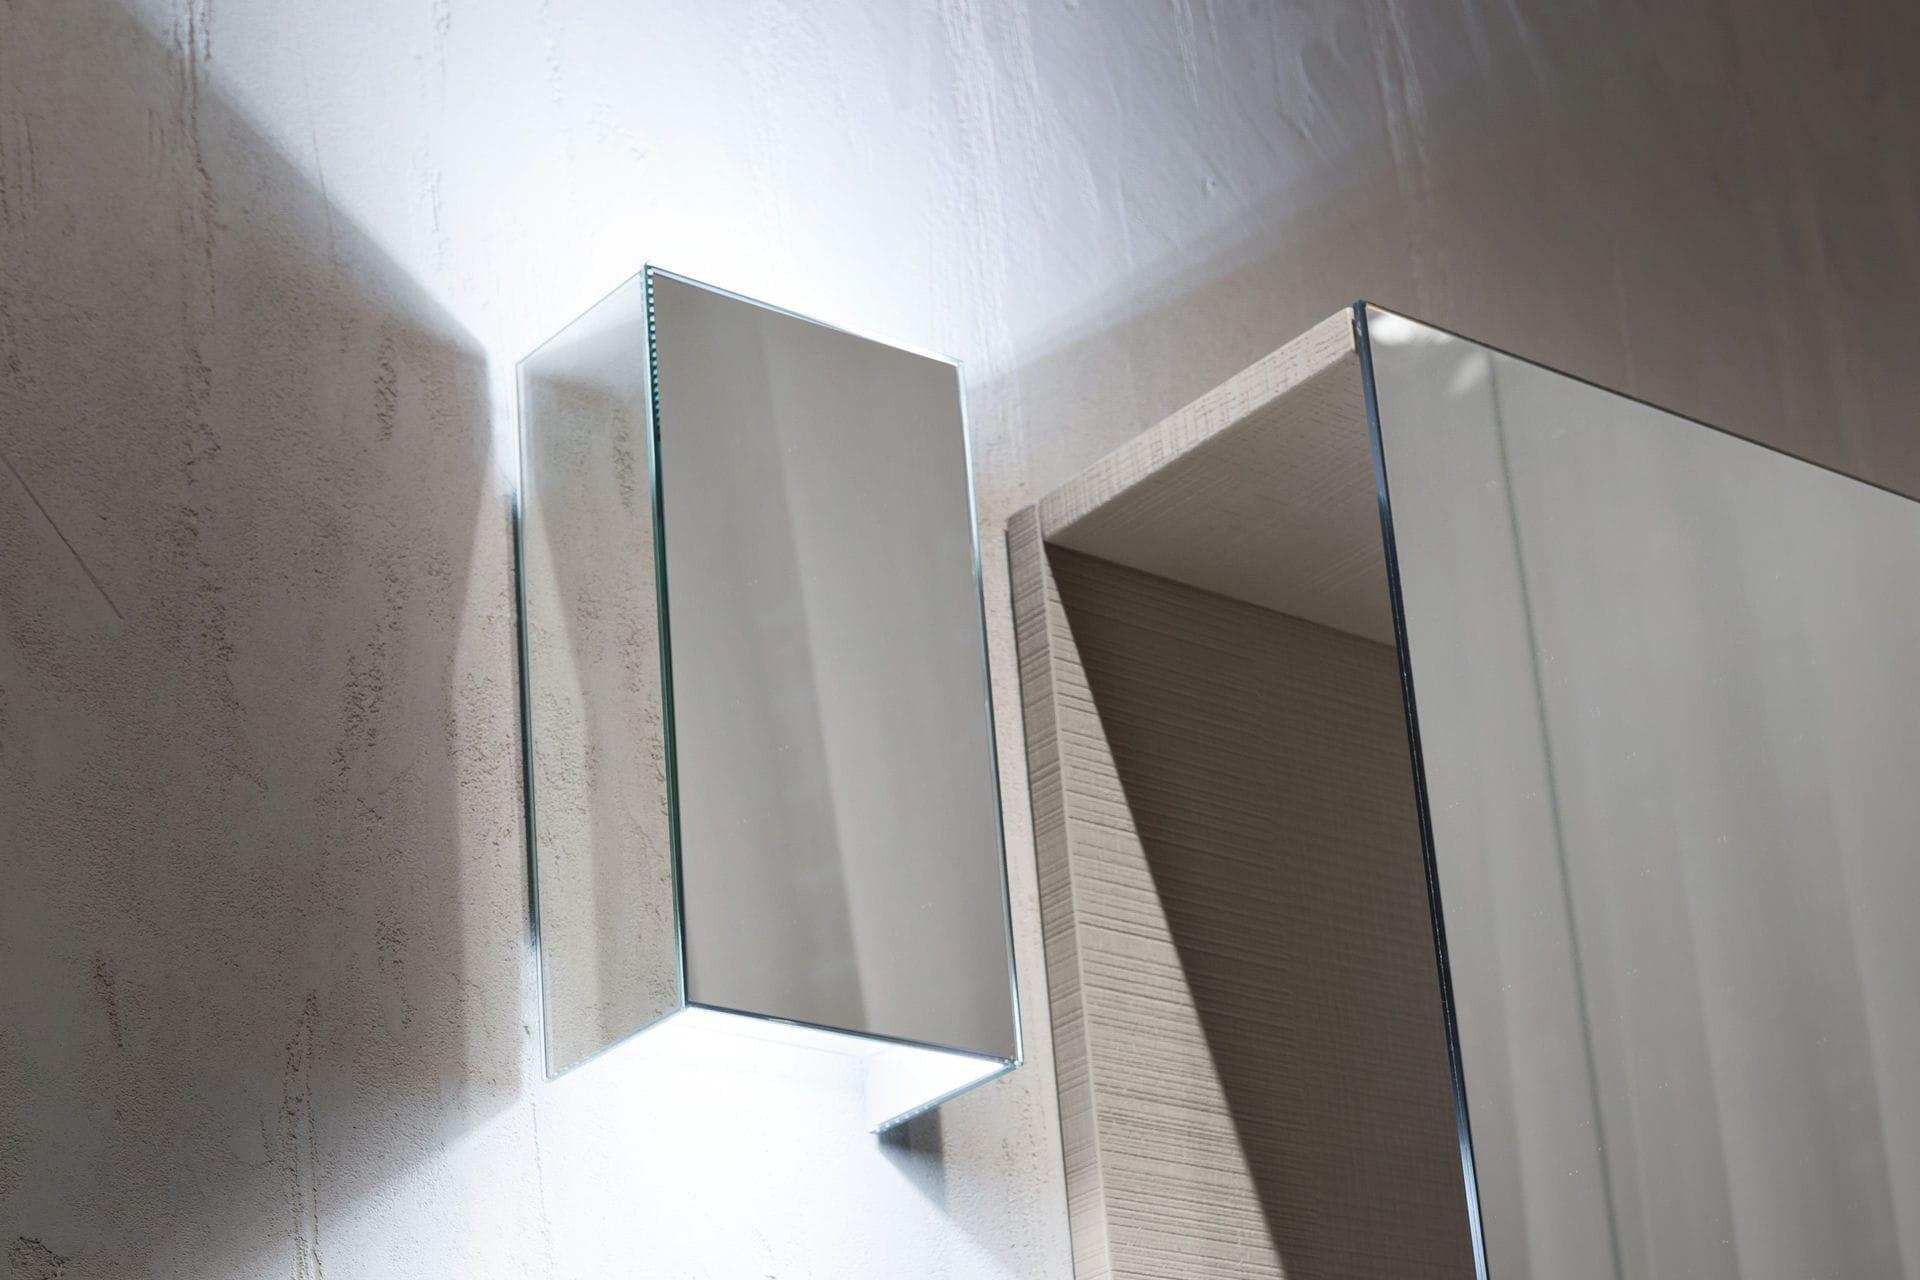 Applique moderna da bagno in vetro legno agorà group